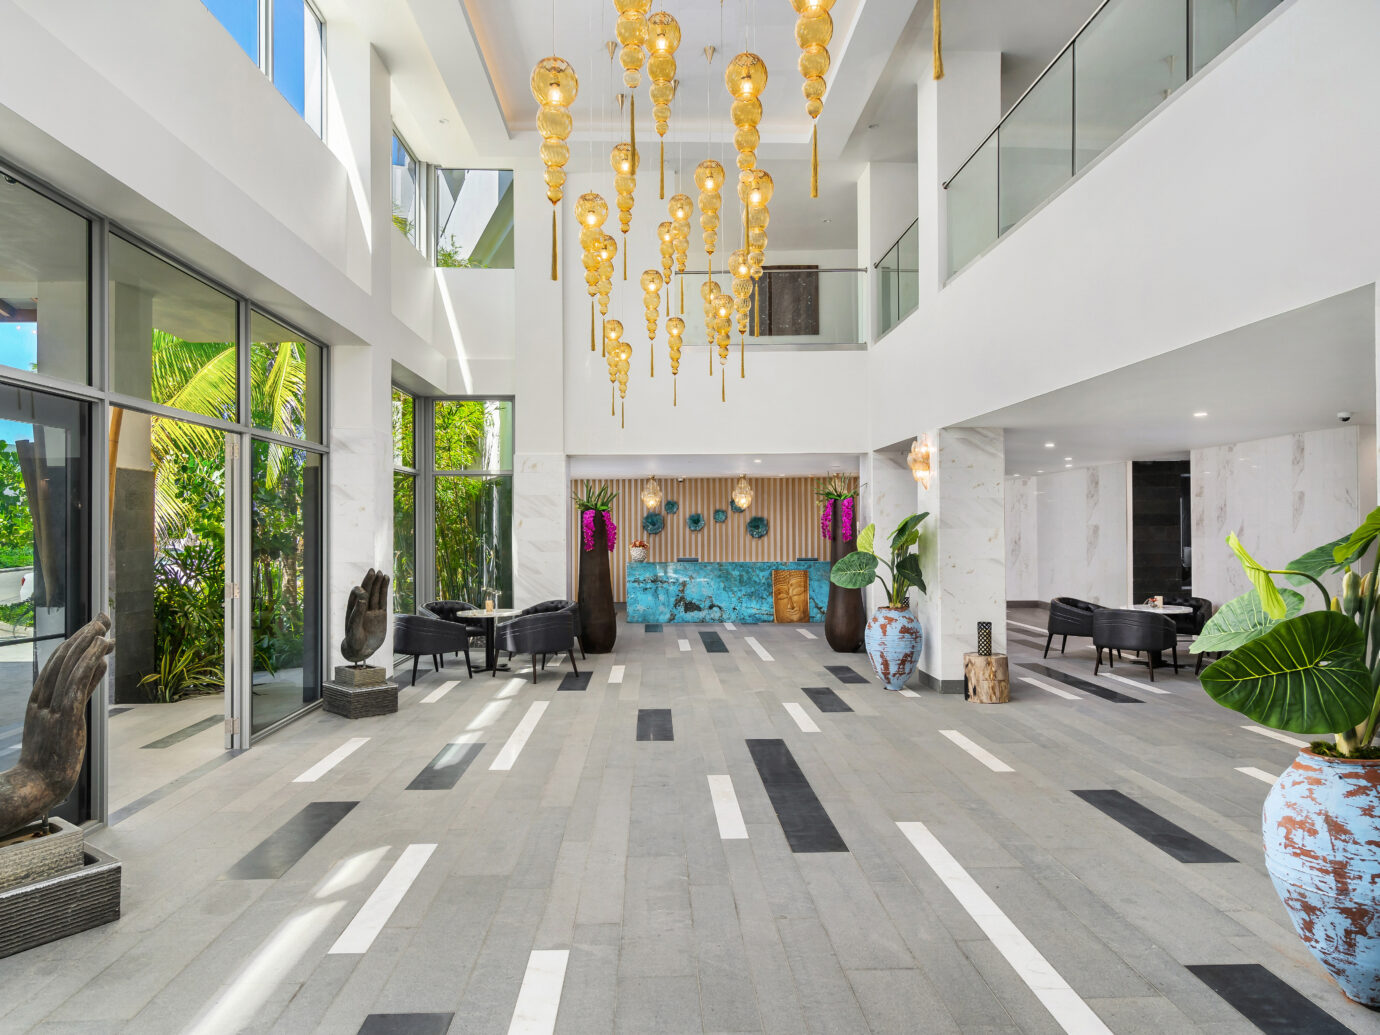 Lobby at Koi Resort St Kitts